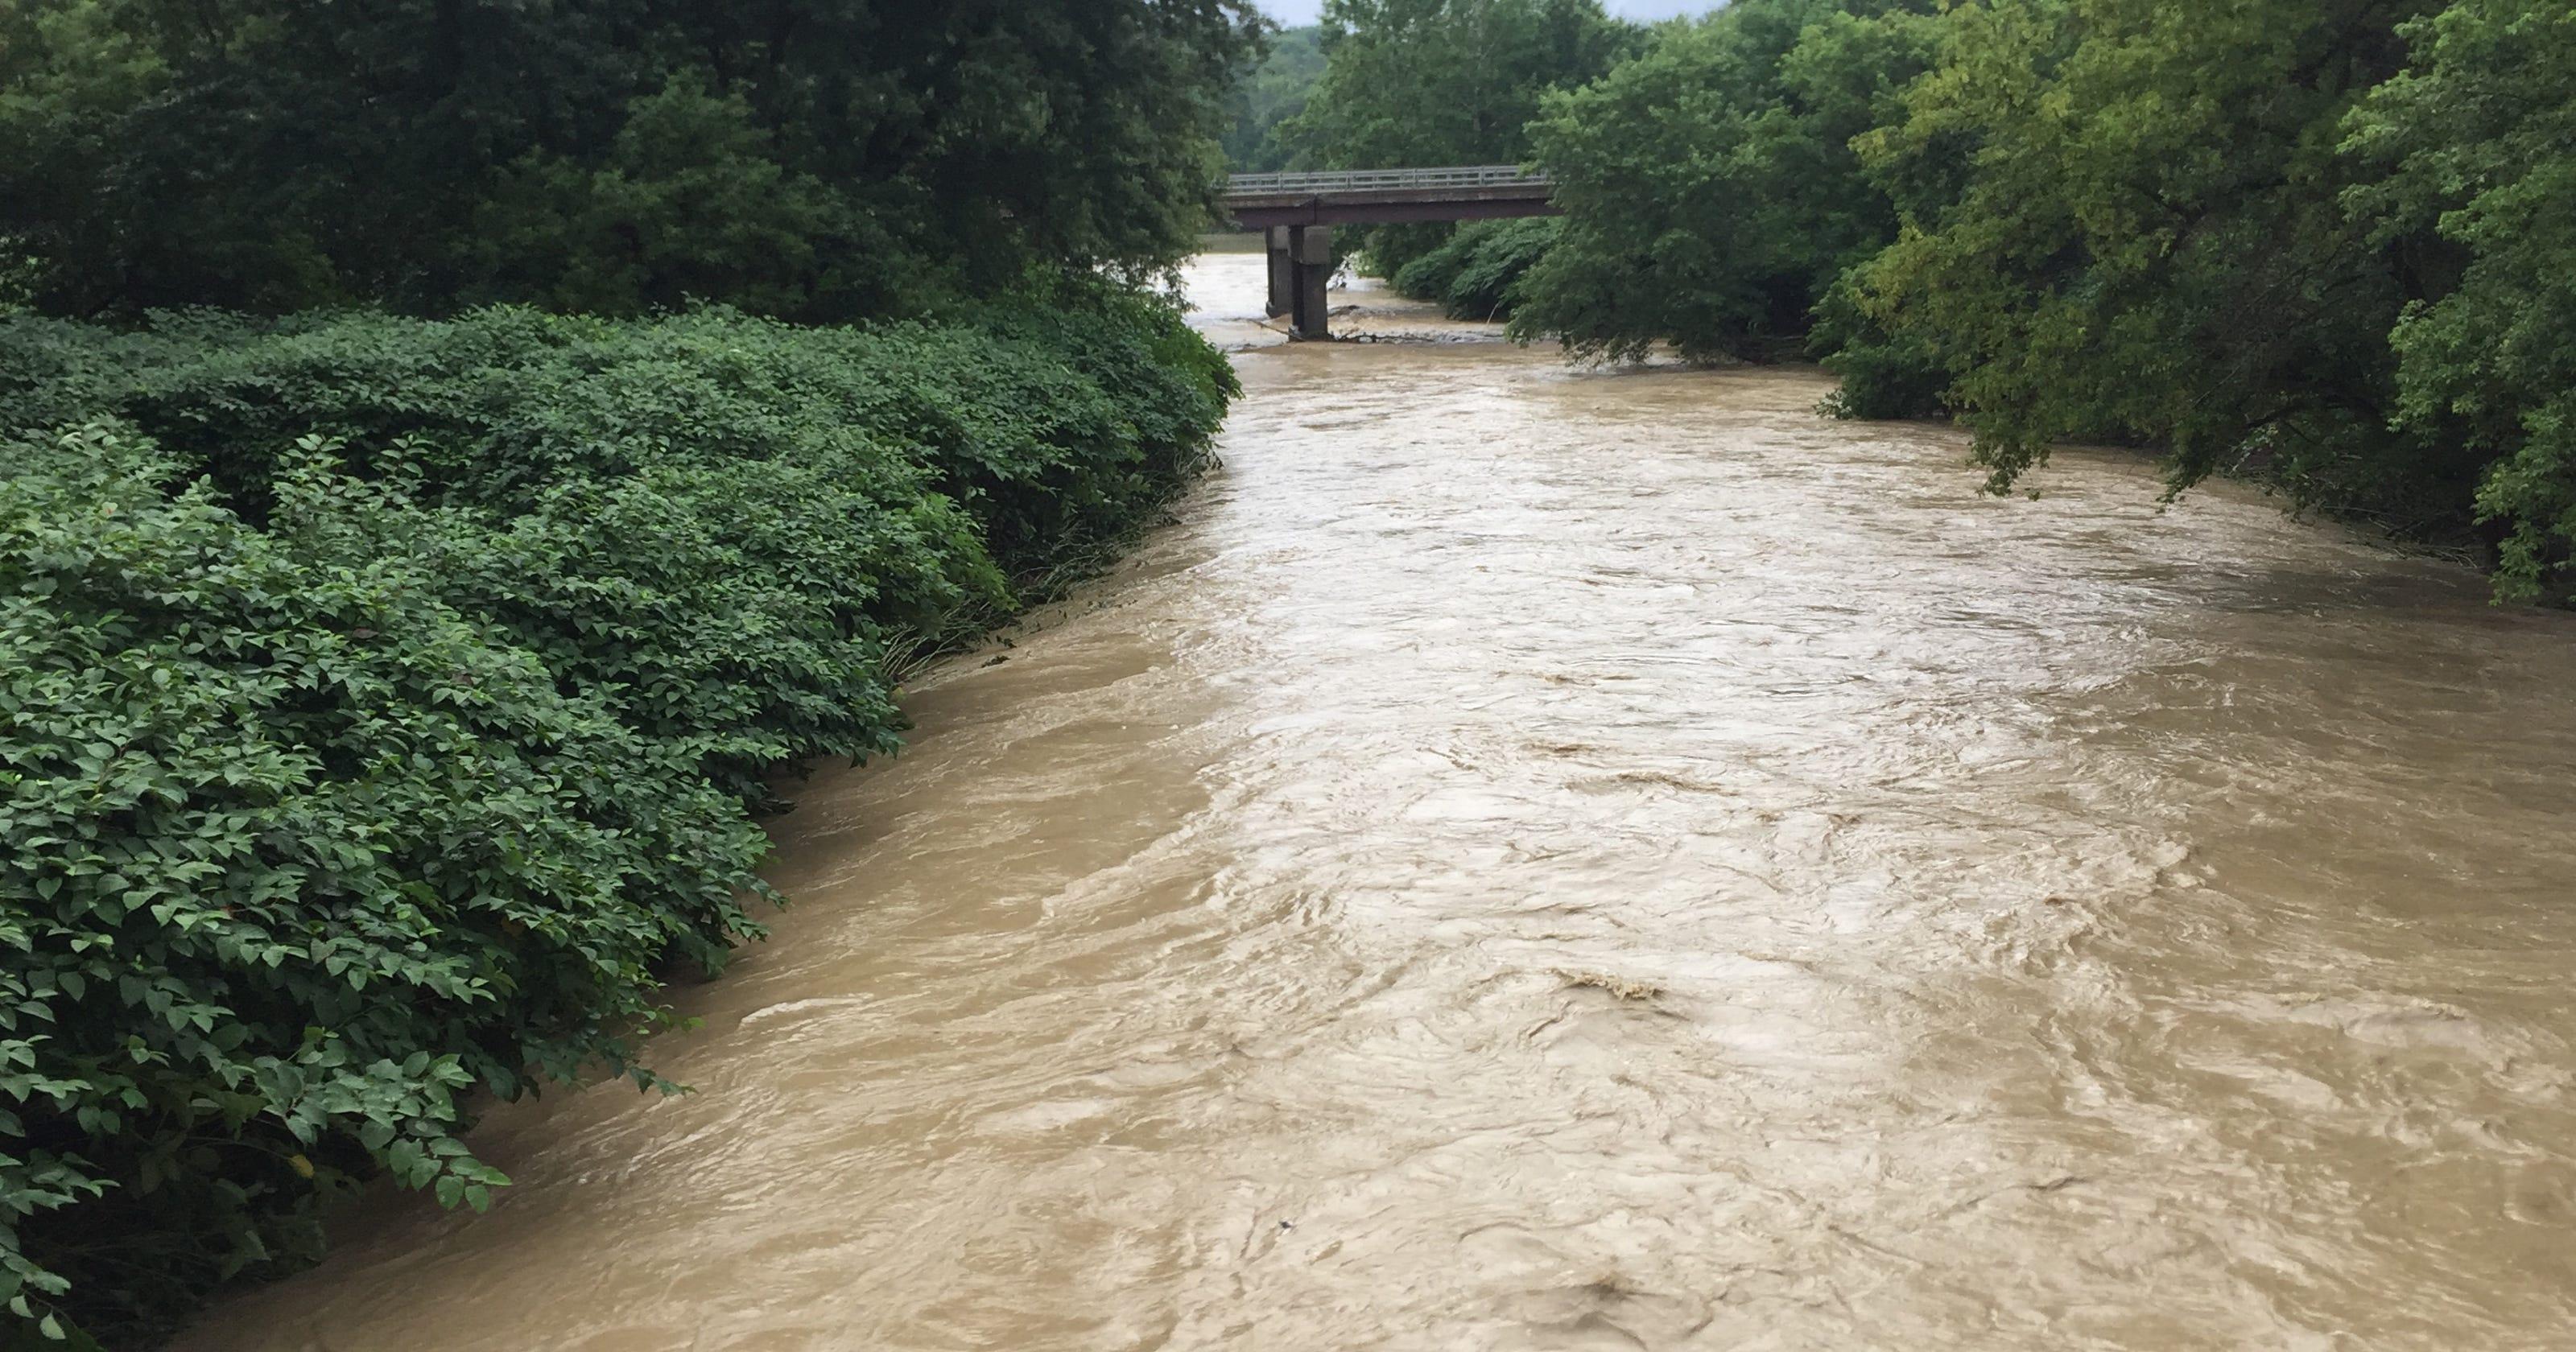 Sewage overflows: Untreated problem in New York waterways